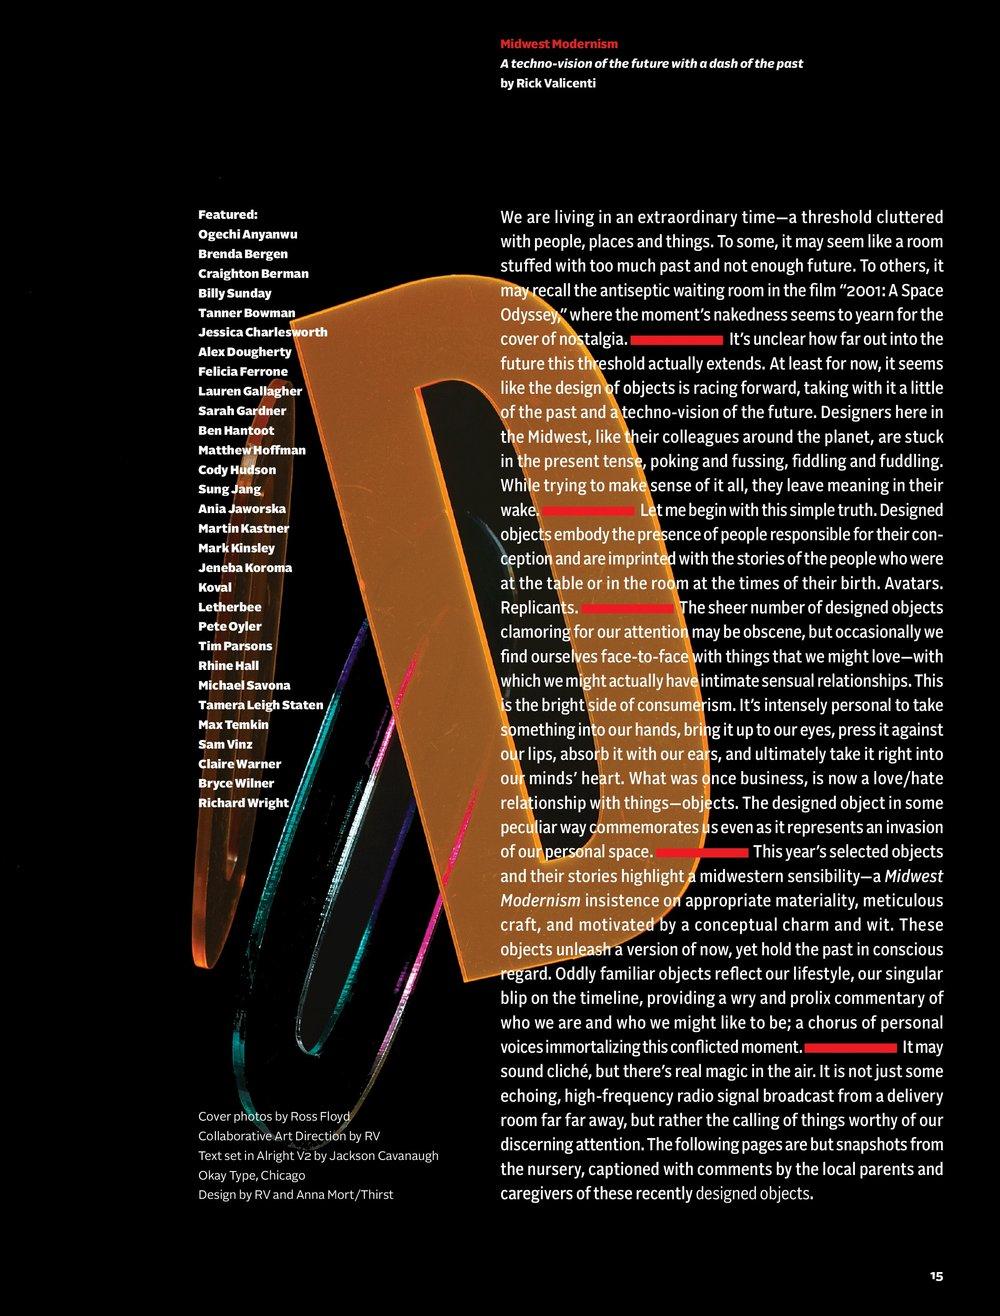 NEWCITY DESIGN / CHGO DSGN DO 2017: Midwest Modernism